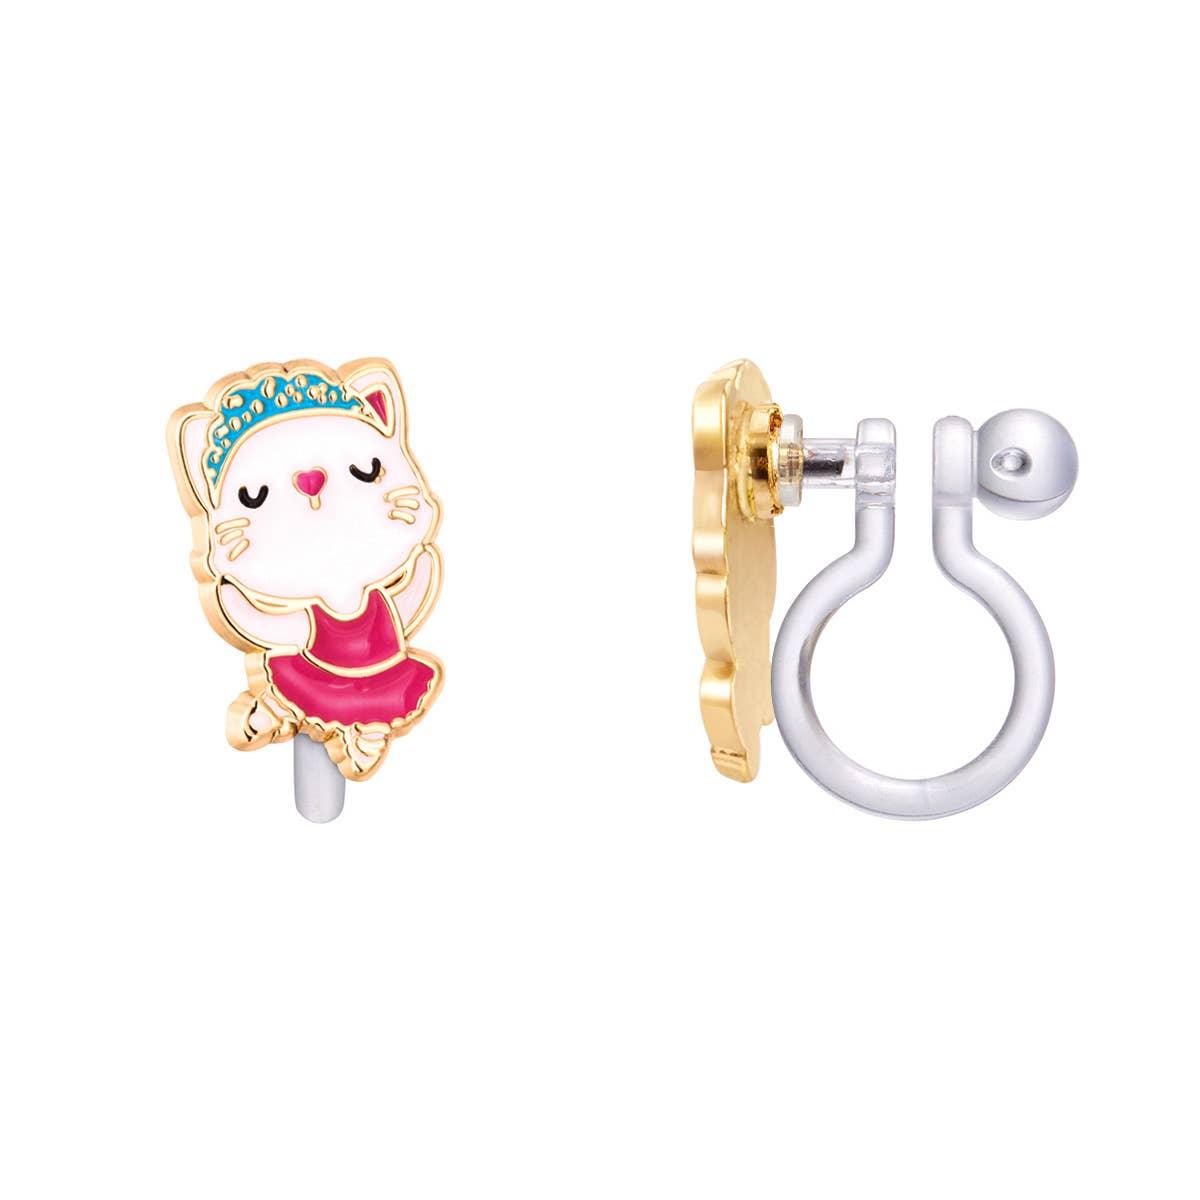 CLIP ON Cutie Earrings- Ballerina Kitty | Trada Marketplace